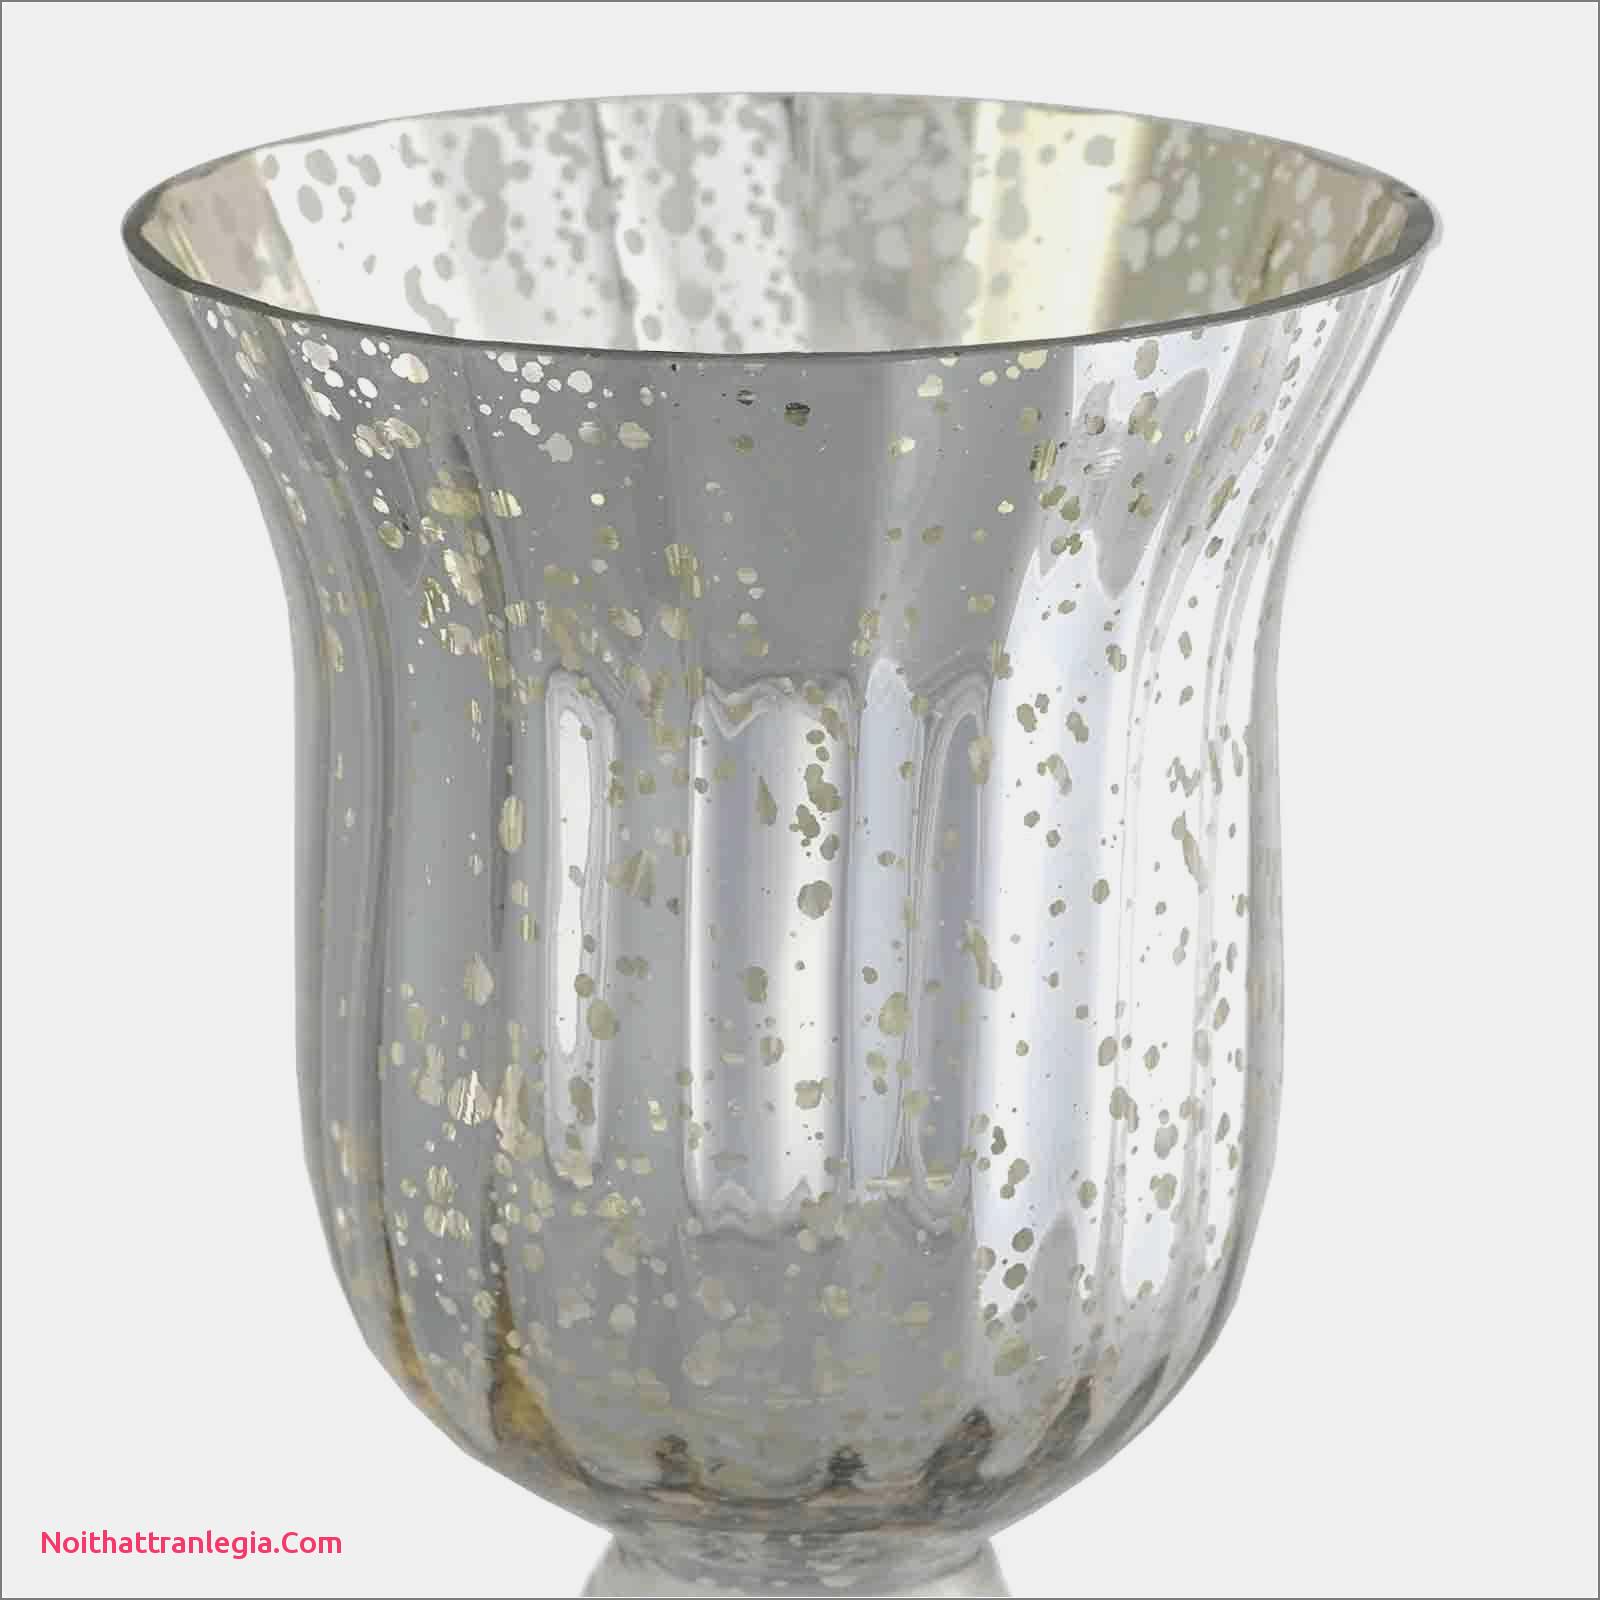 24 vases in bulk of 20 wedding vases noithattranlegia vases design inside wedding guest gift ideas inspirational candles for wedding favors superb pe s5h vases candle vase i